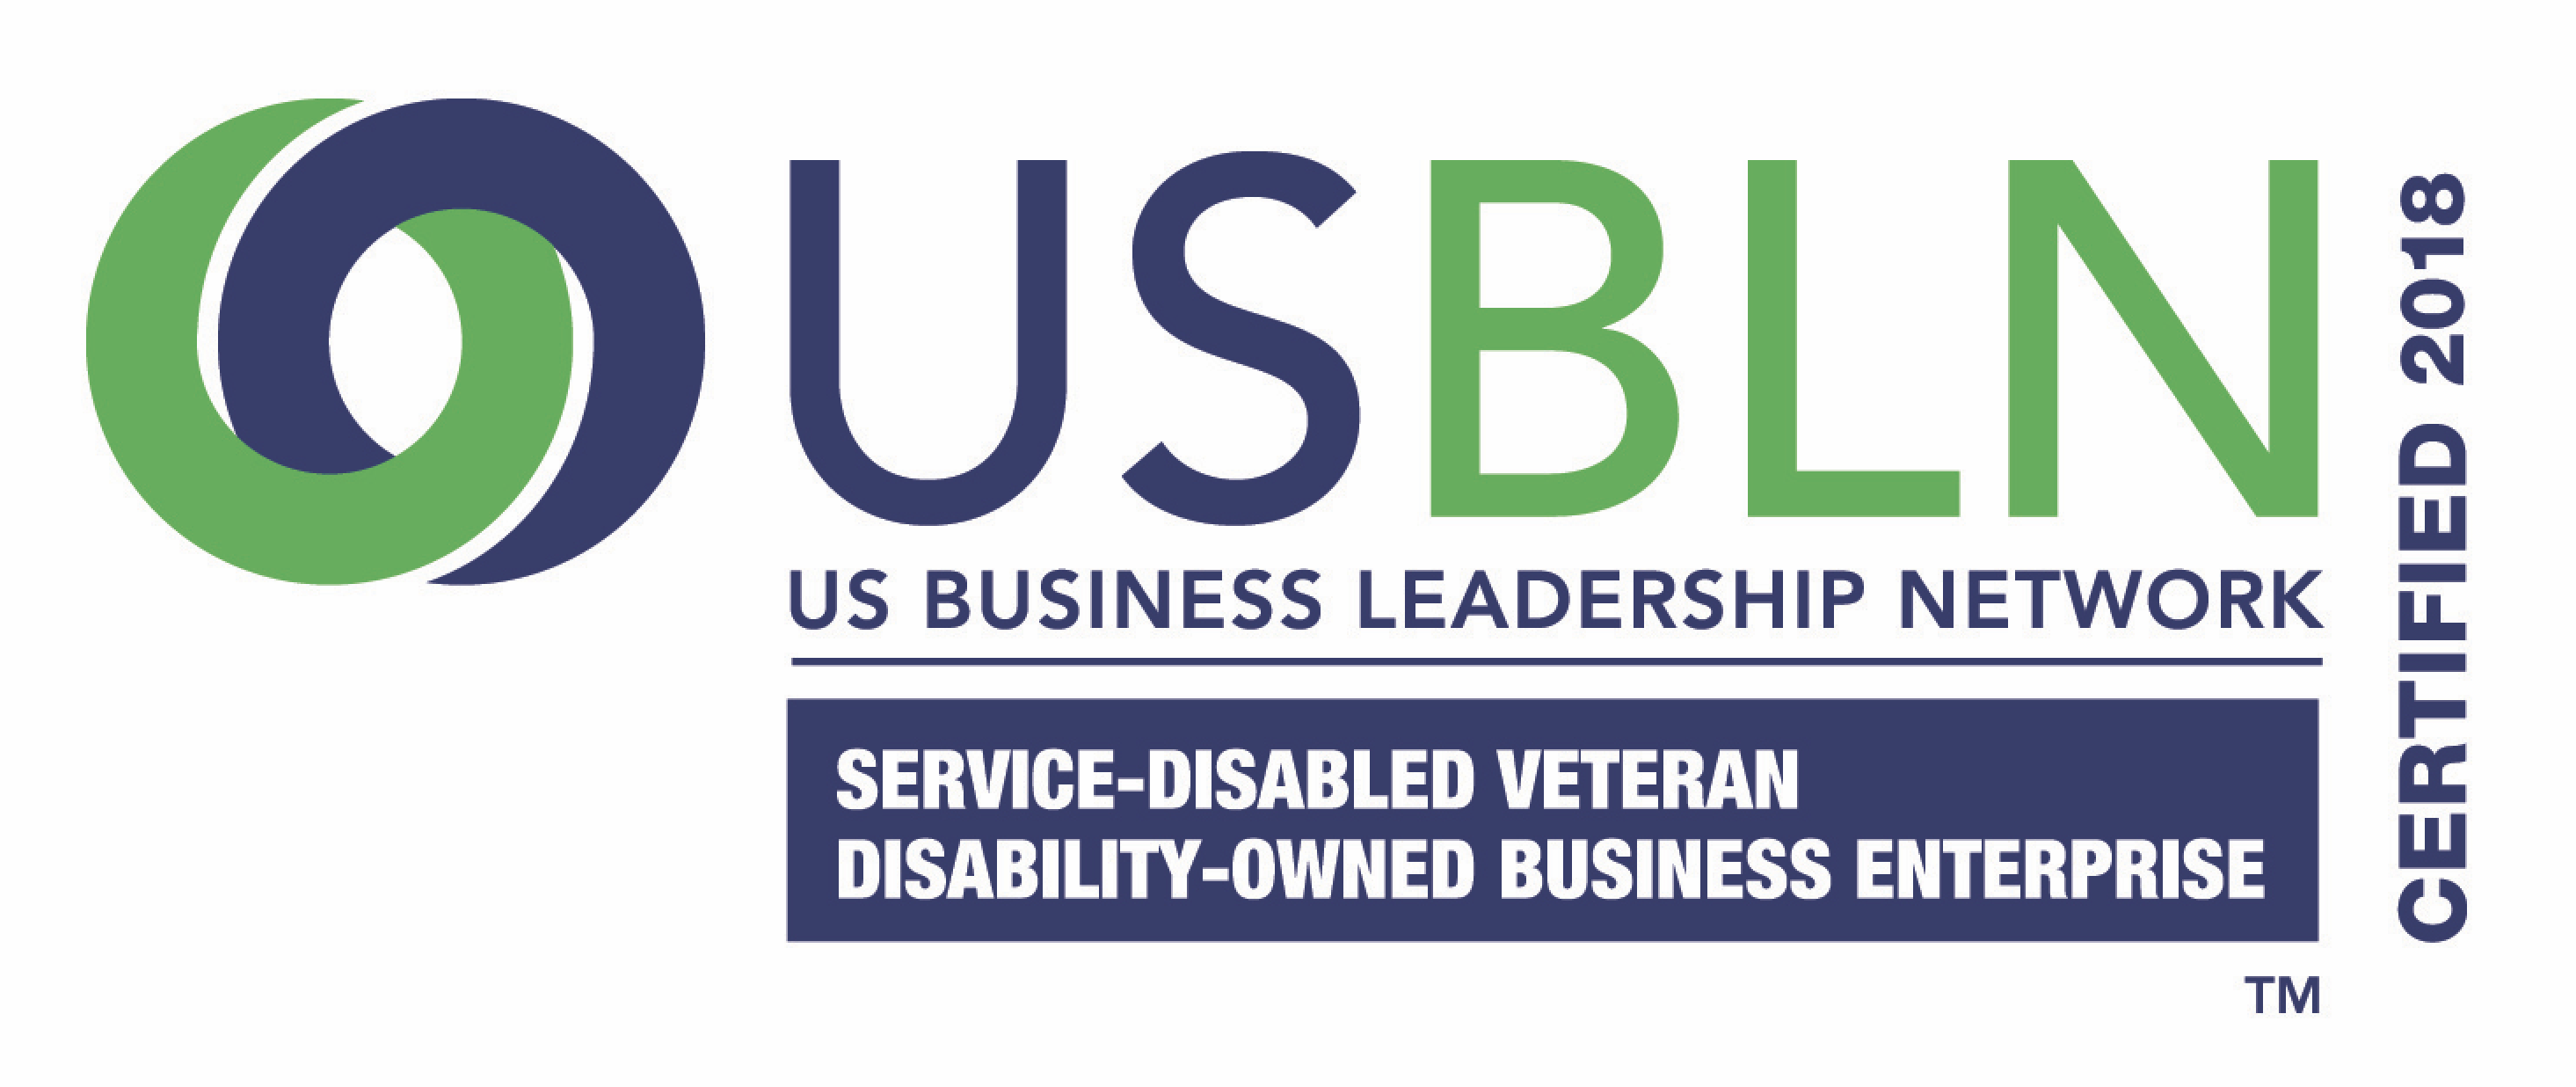 US Business Leadership Network (USBLN)